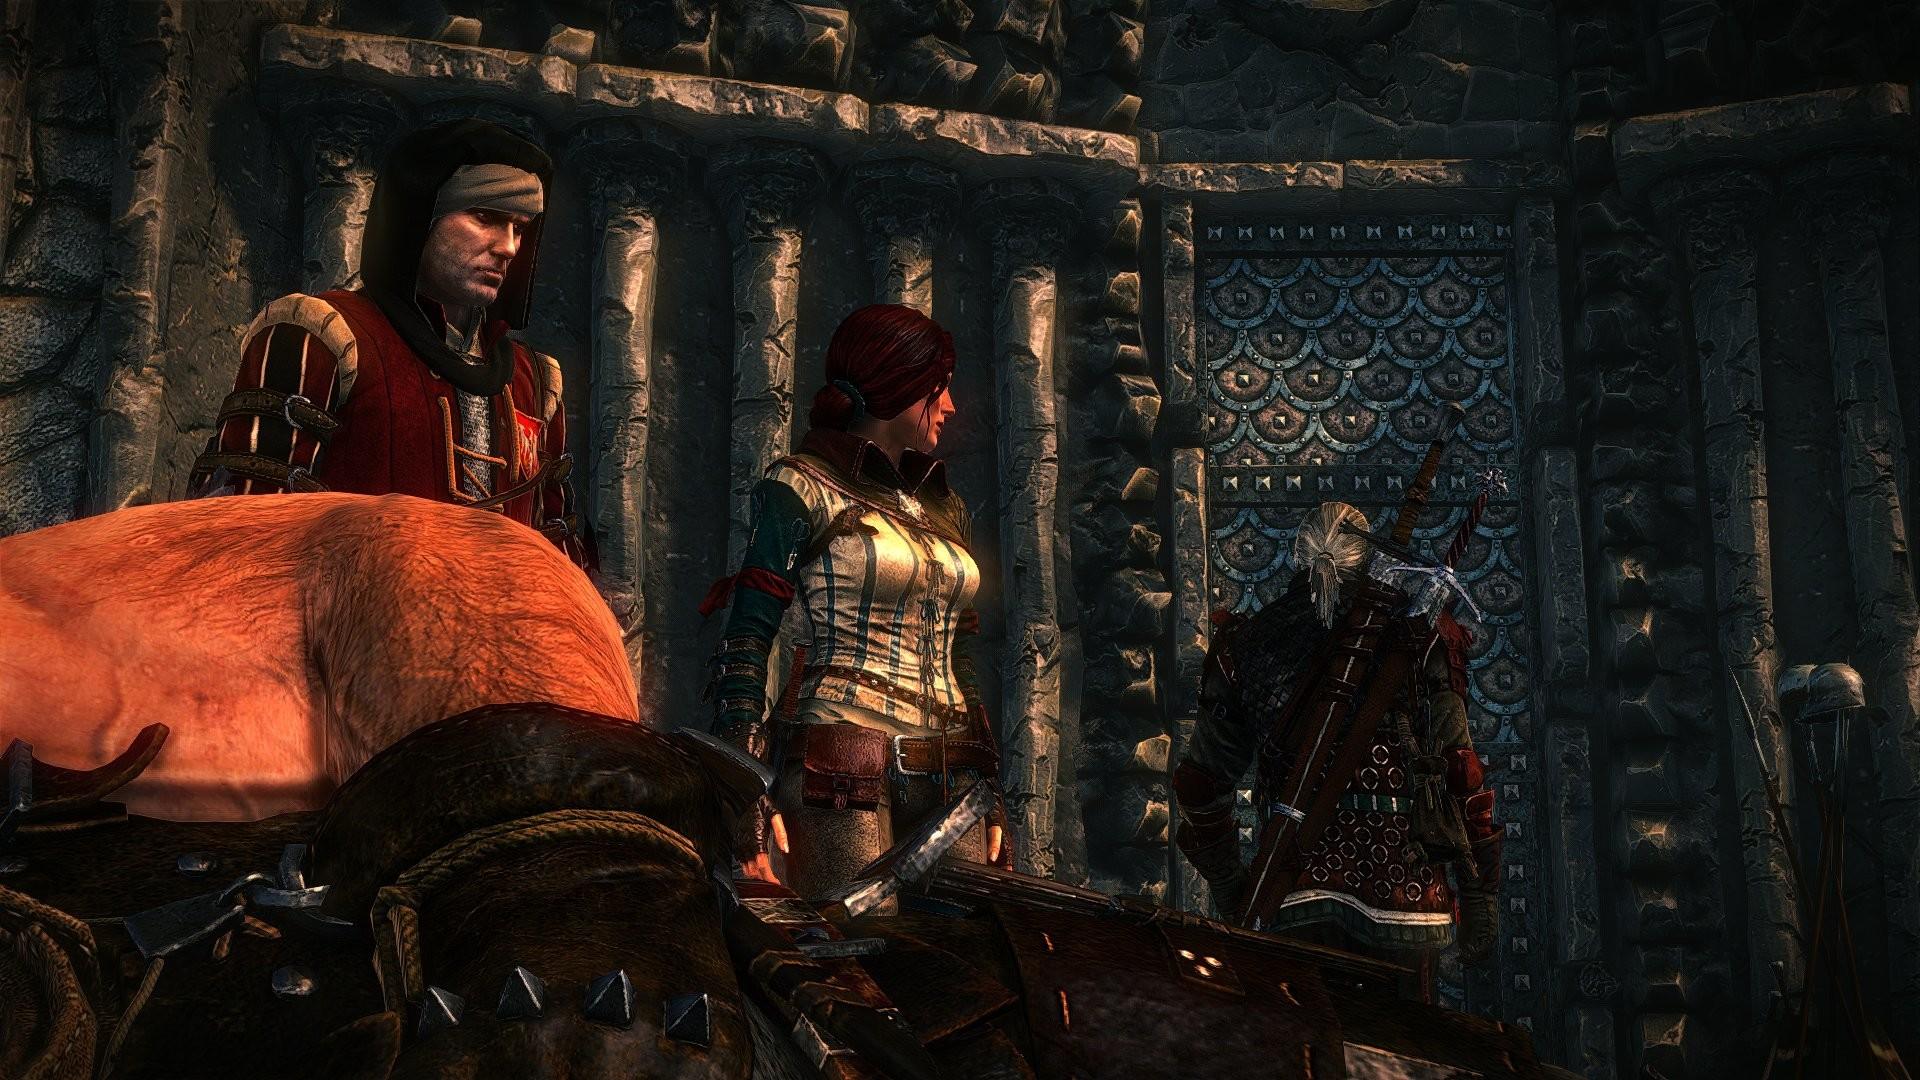 The Witcher 2 Assassins of Kings Geralt Triss Merigold Vernon Roche Letho  Dead Death wallpaper     785202   WallpaperUP